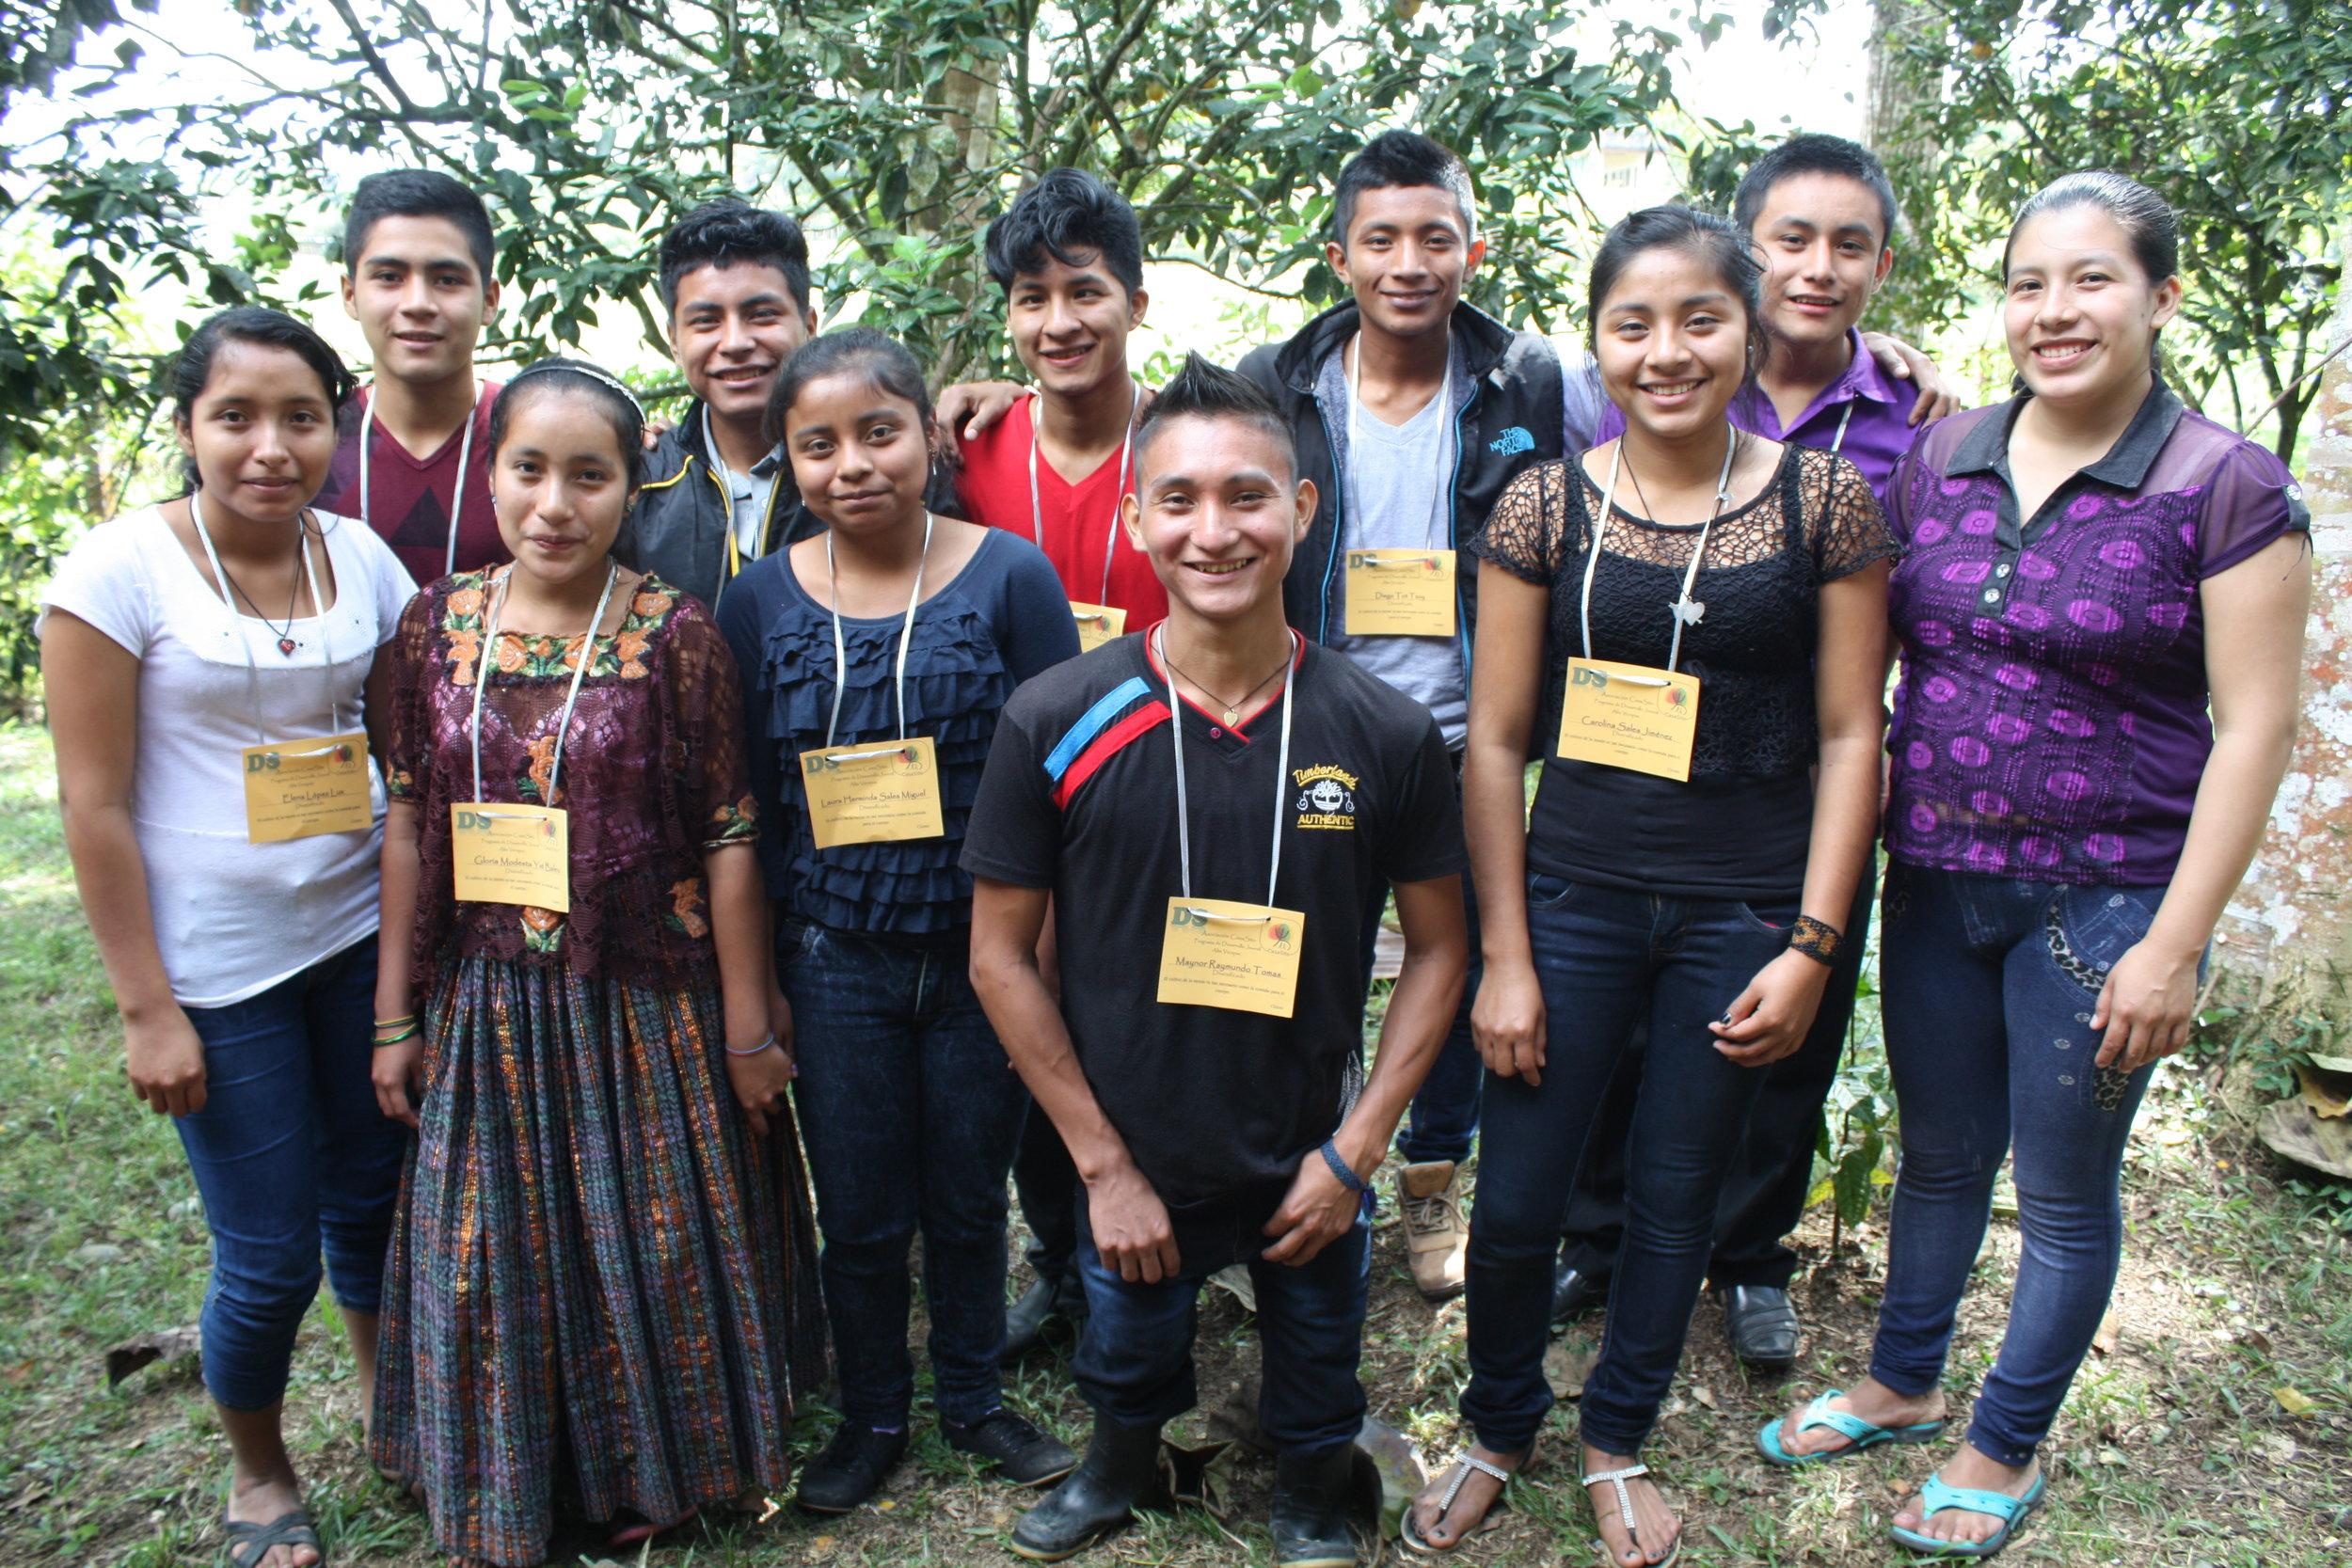 La Primavera Scholarship Students 2018